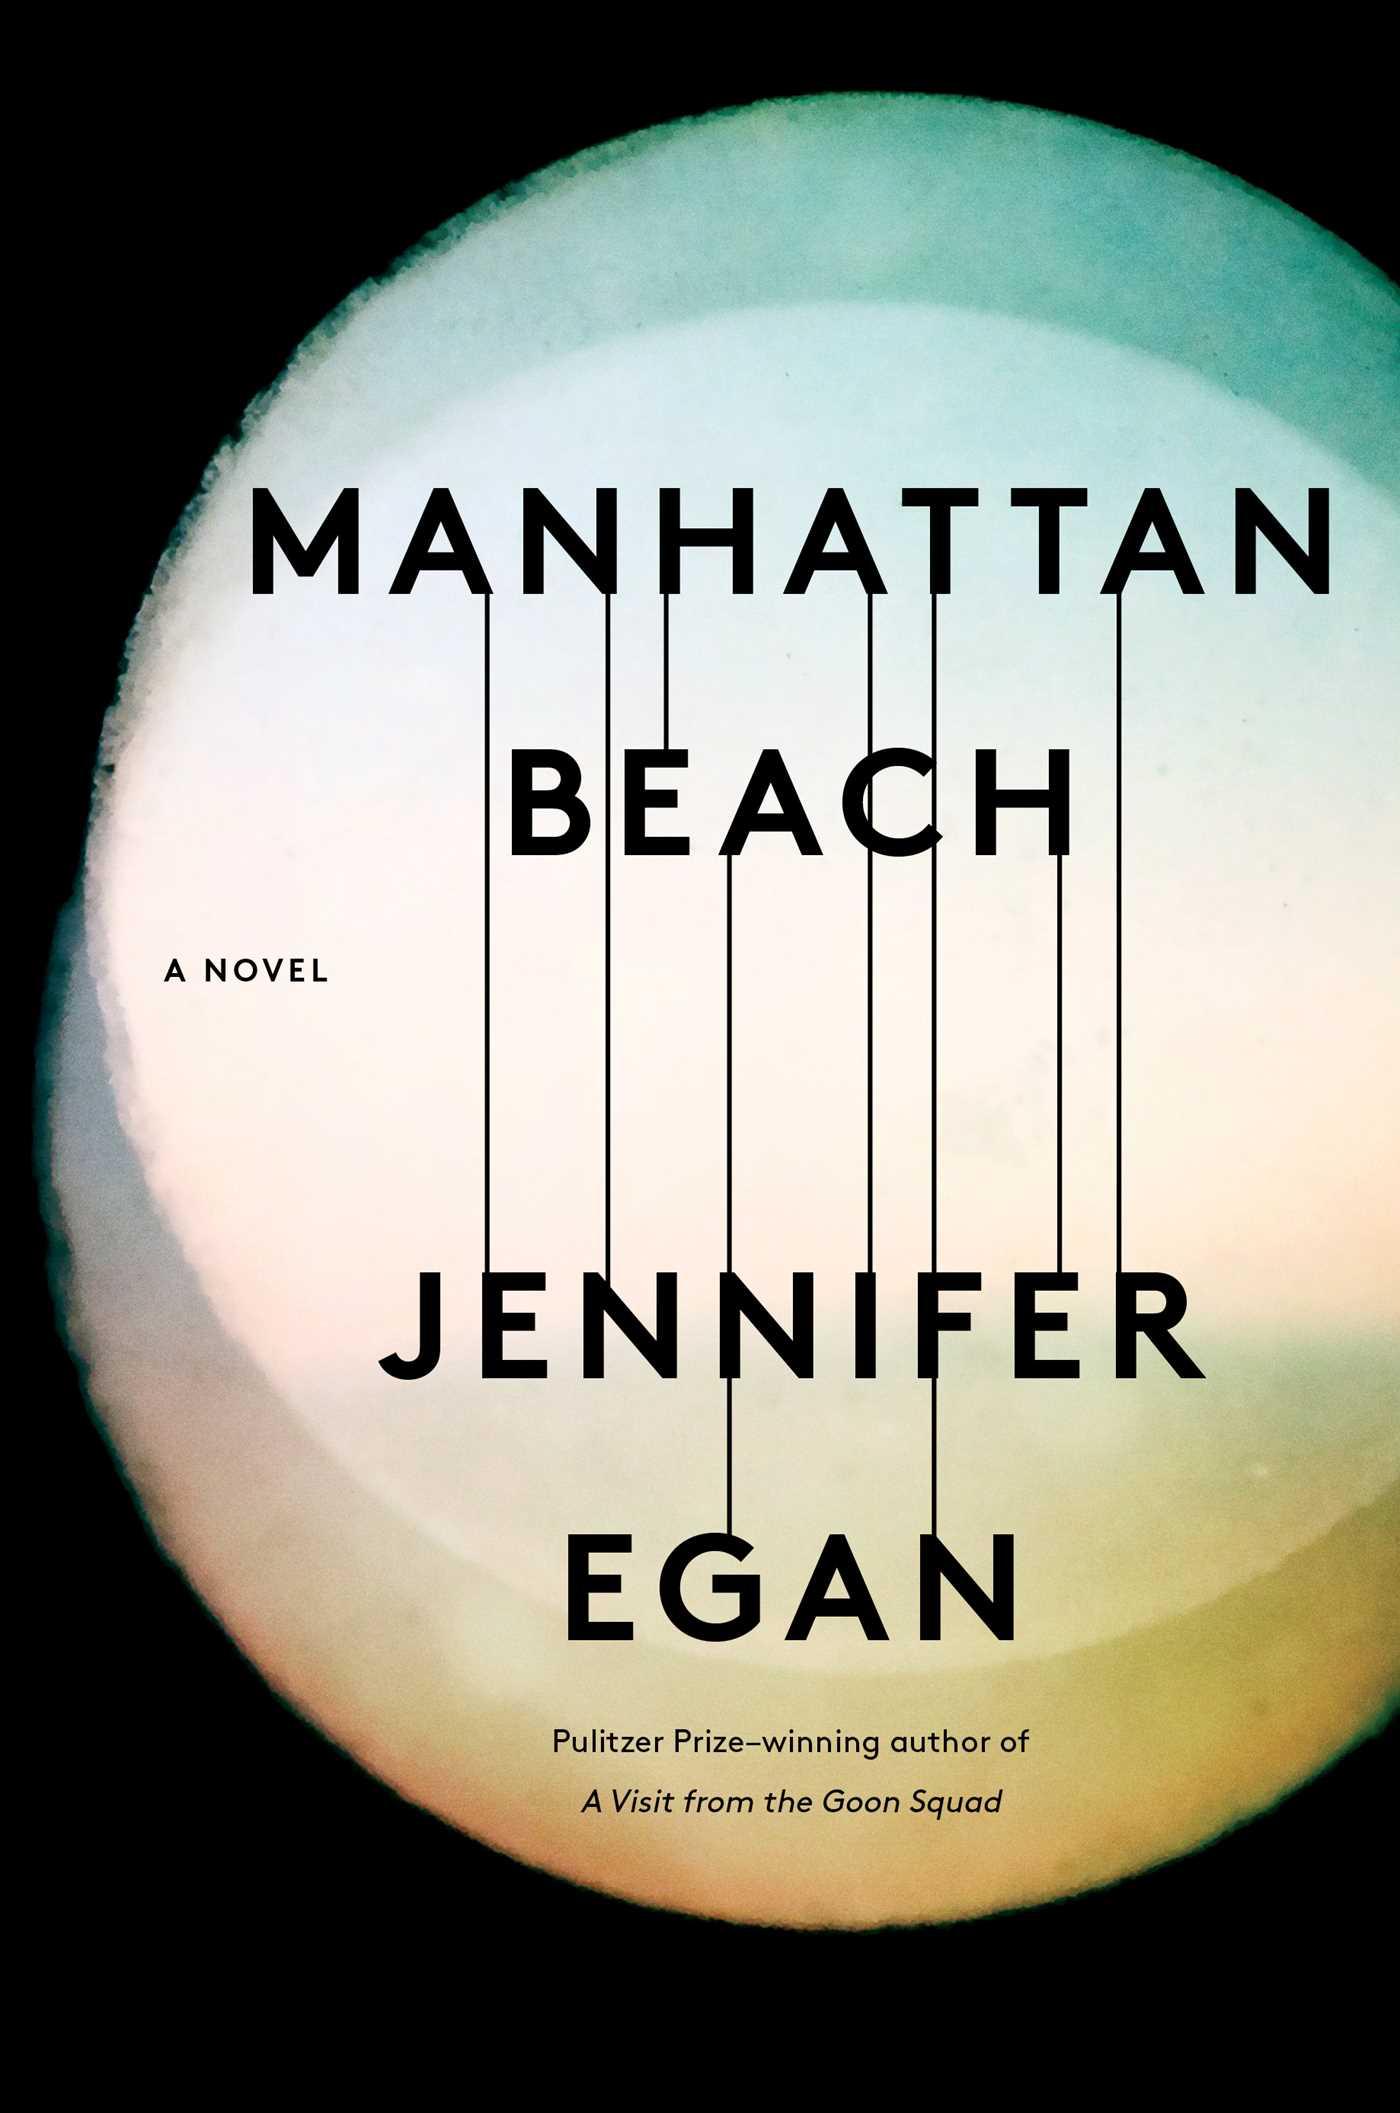 Interview with author Jennifer Egan on her new book, Manhattan Beach